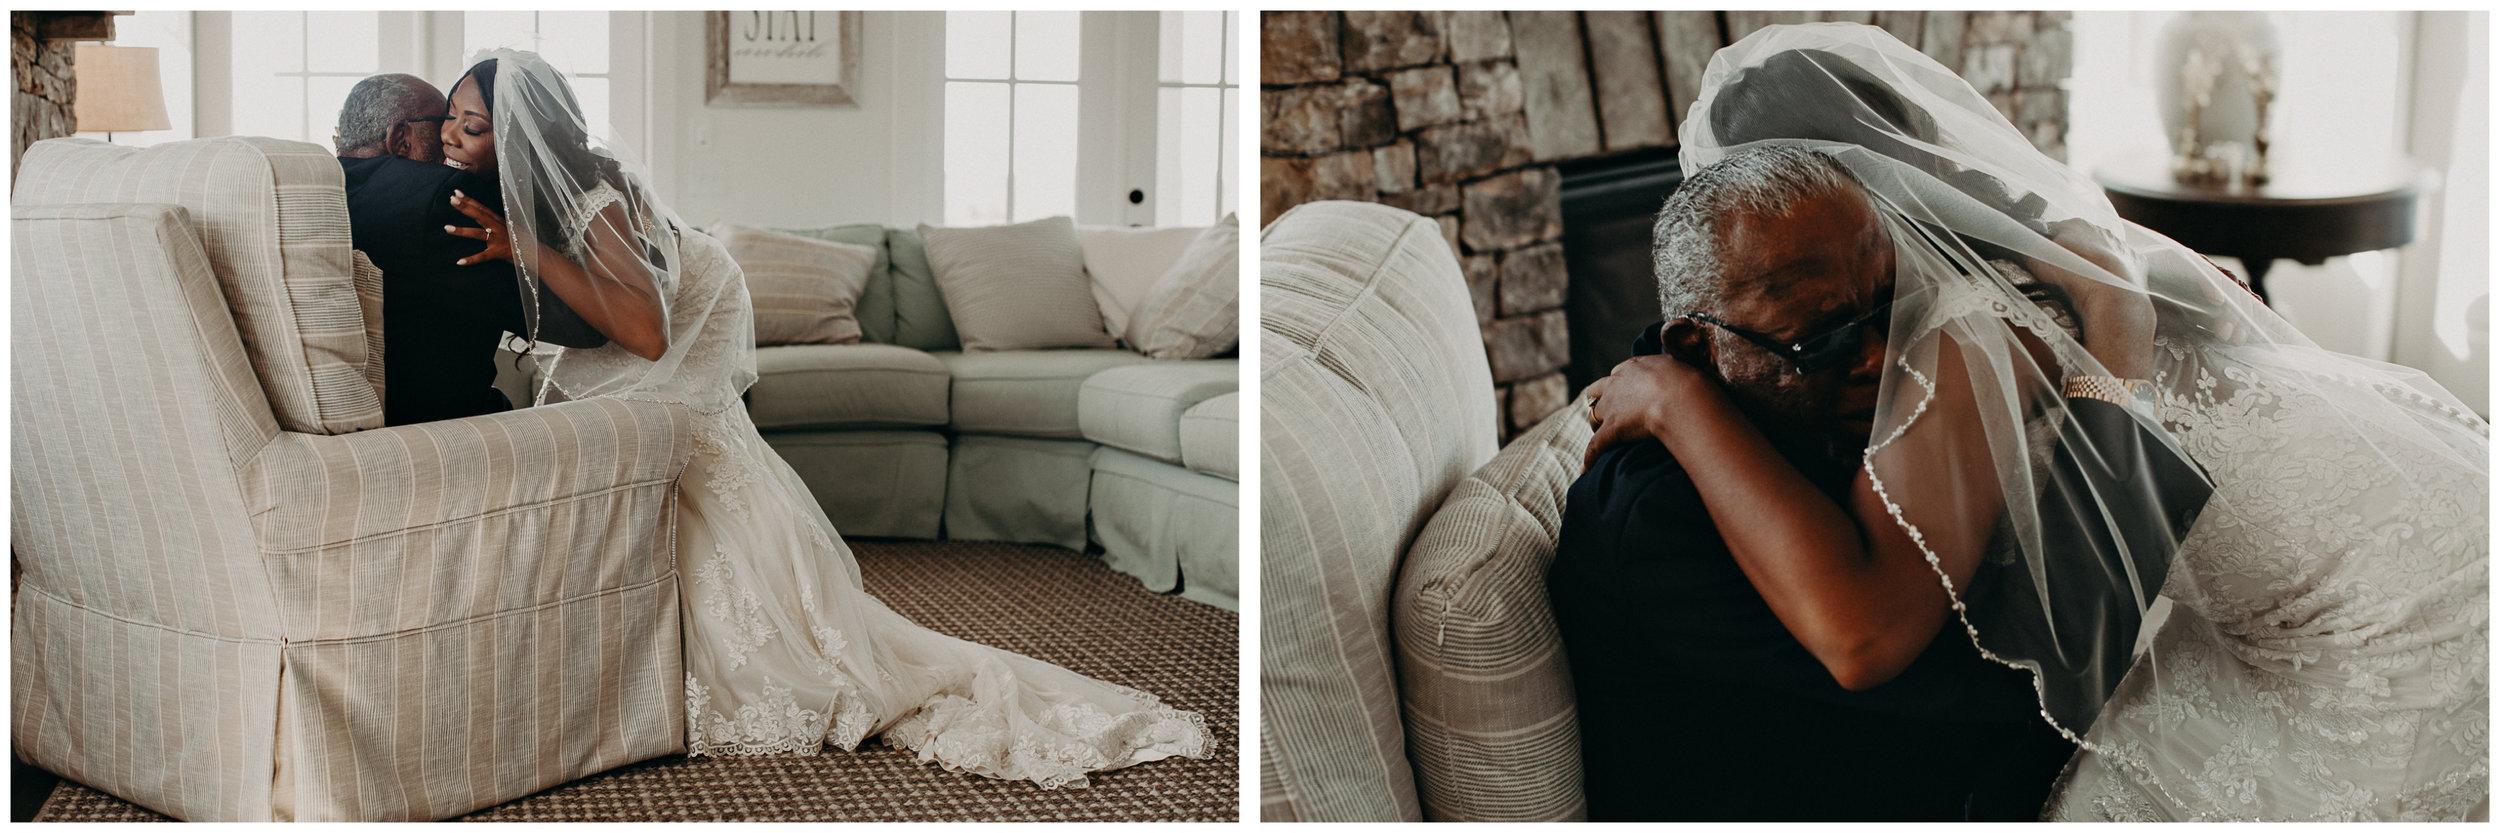 21- Wedding_day_atlanta_georgia_bride_dad_first_look_aline_marin_photography_-12.jpg